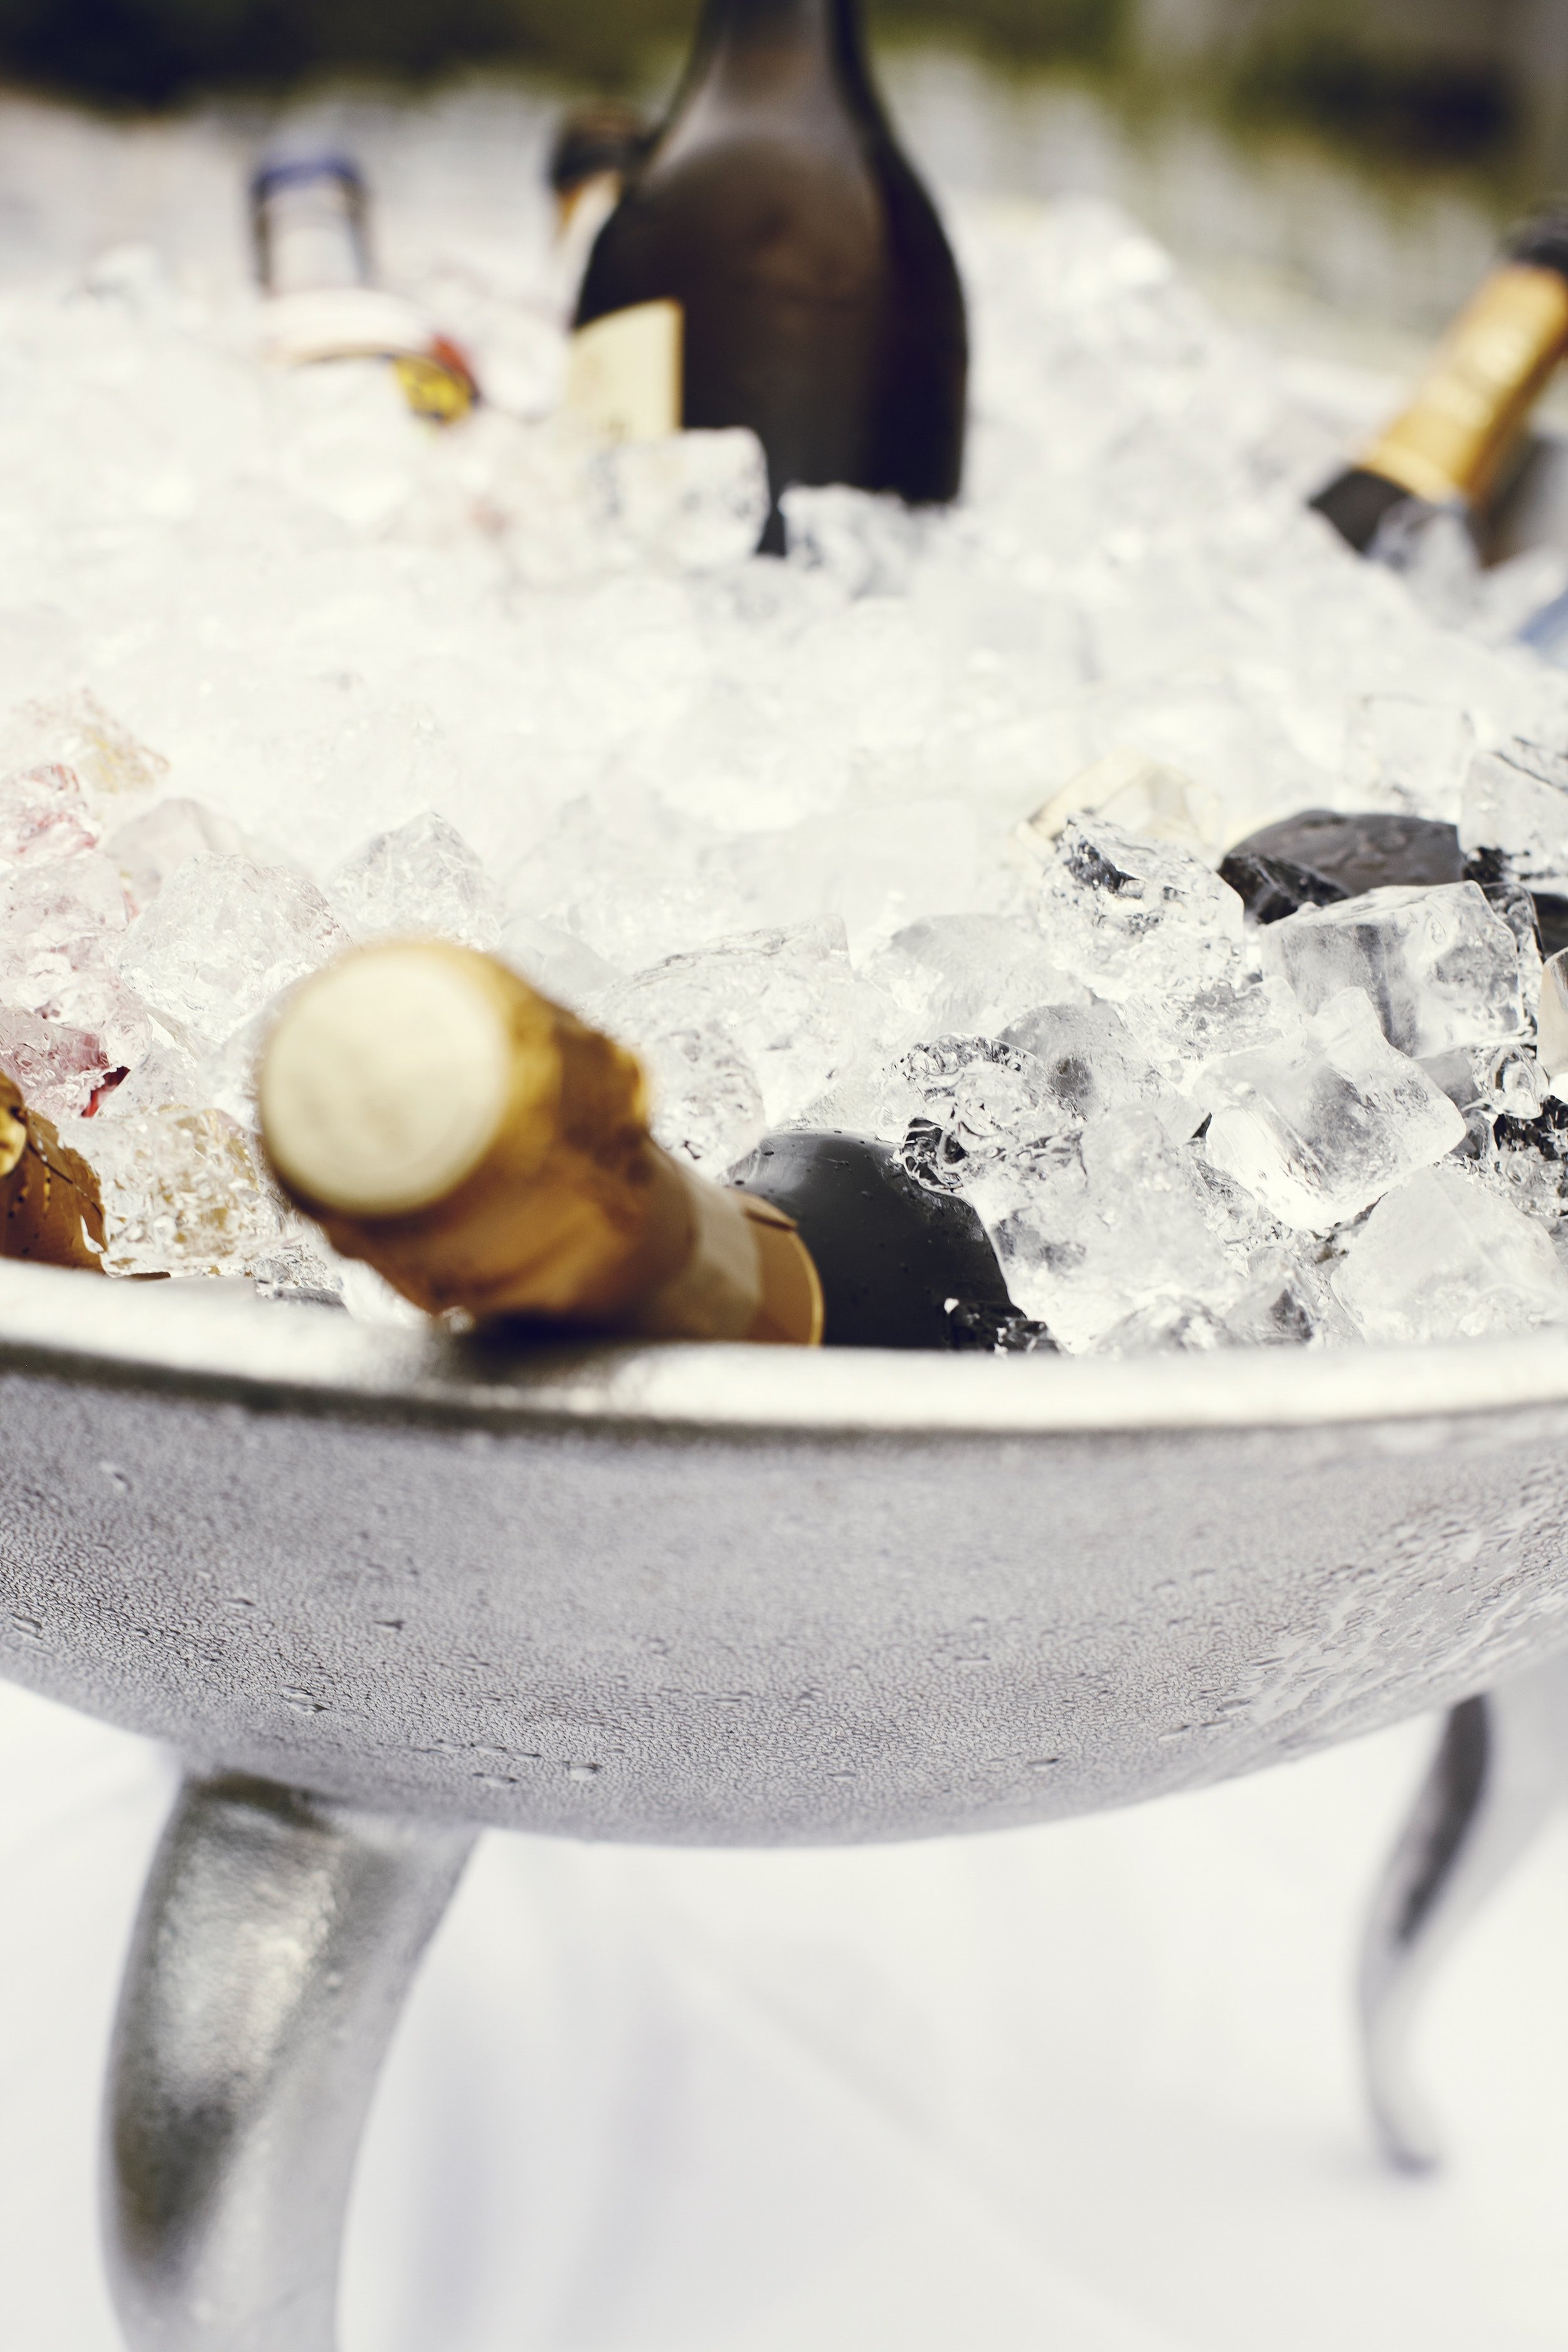 alcoholic-alcoholic-beverages-beverage-373067.jpg